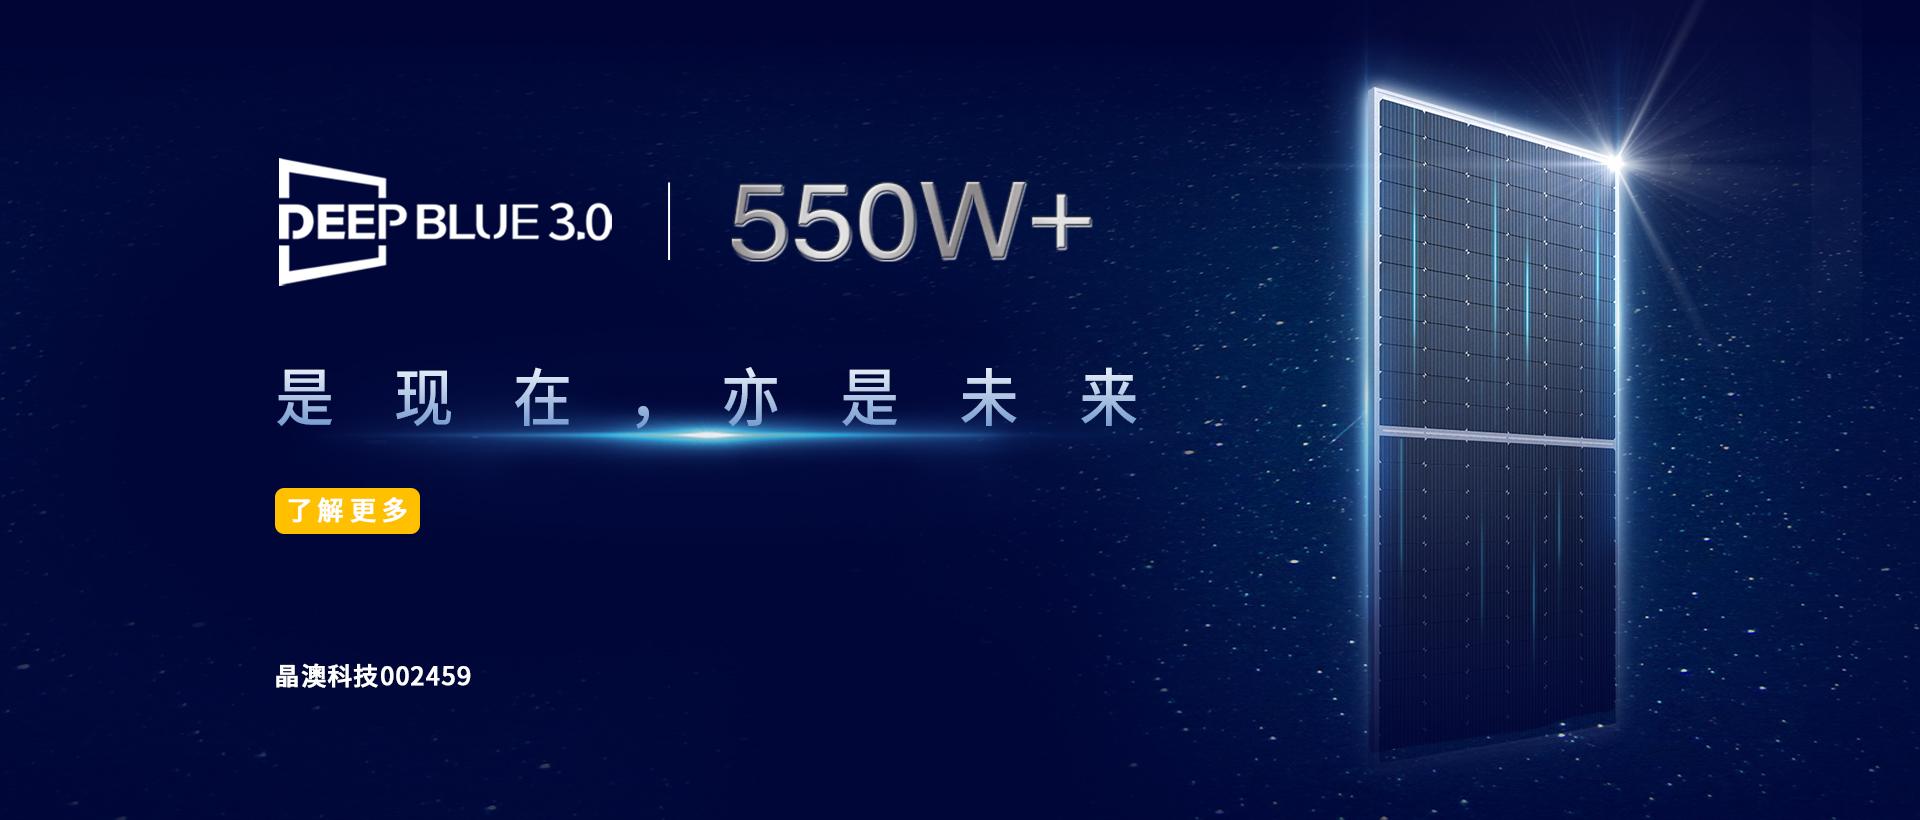 550w+